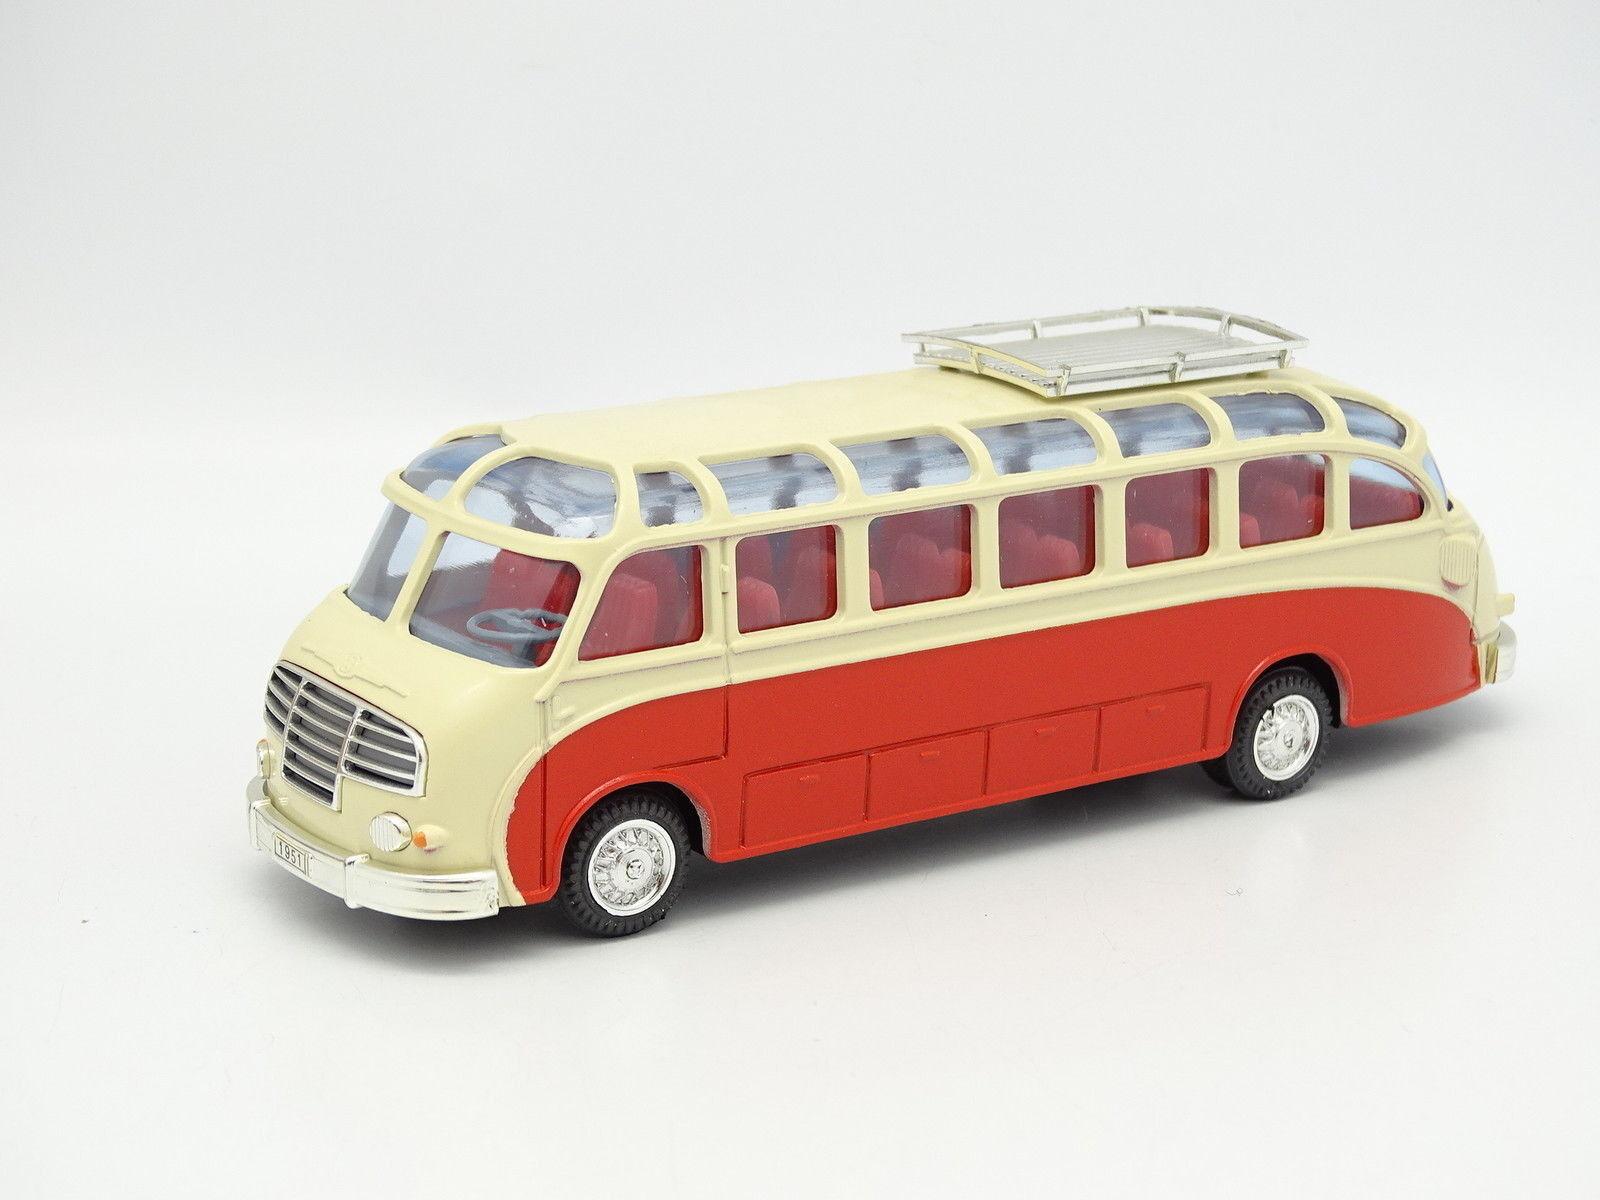 Cursore 1 50 - Kässbohrer Setra S8 Reisebus 1951 red